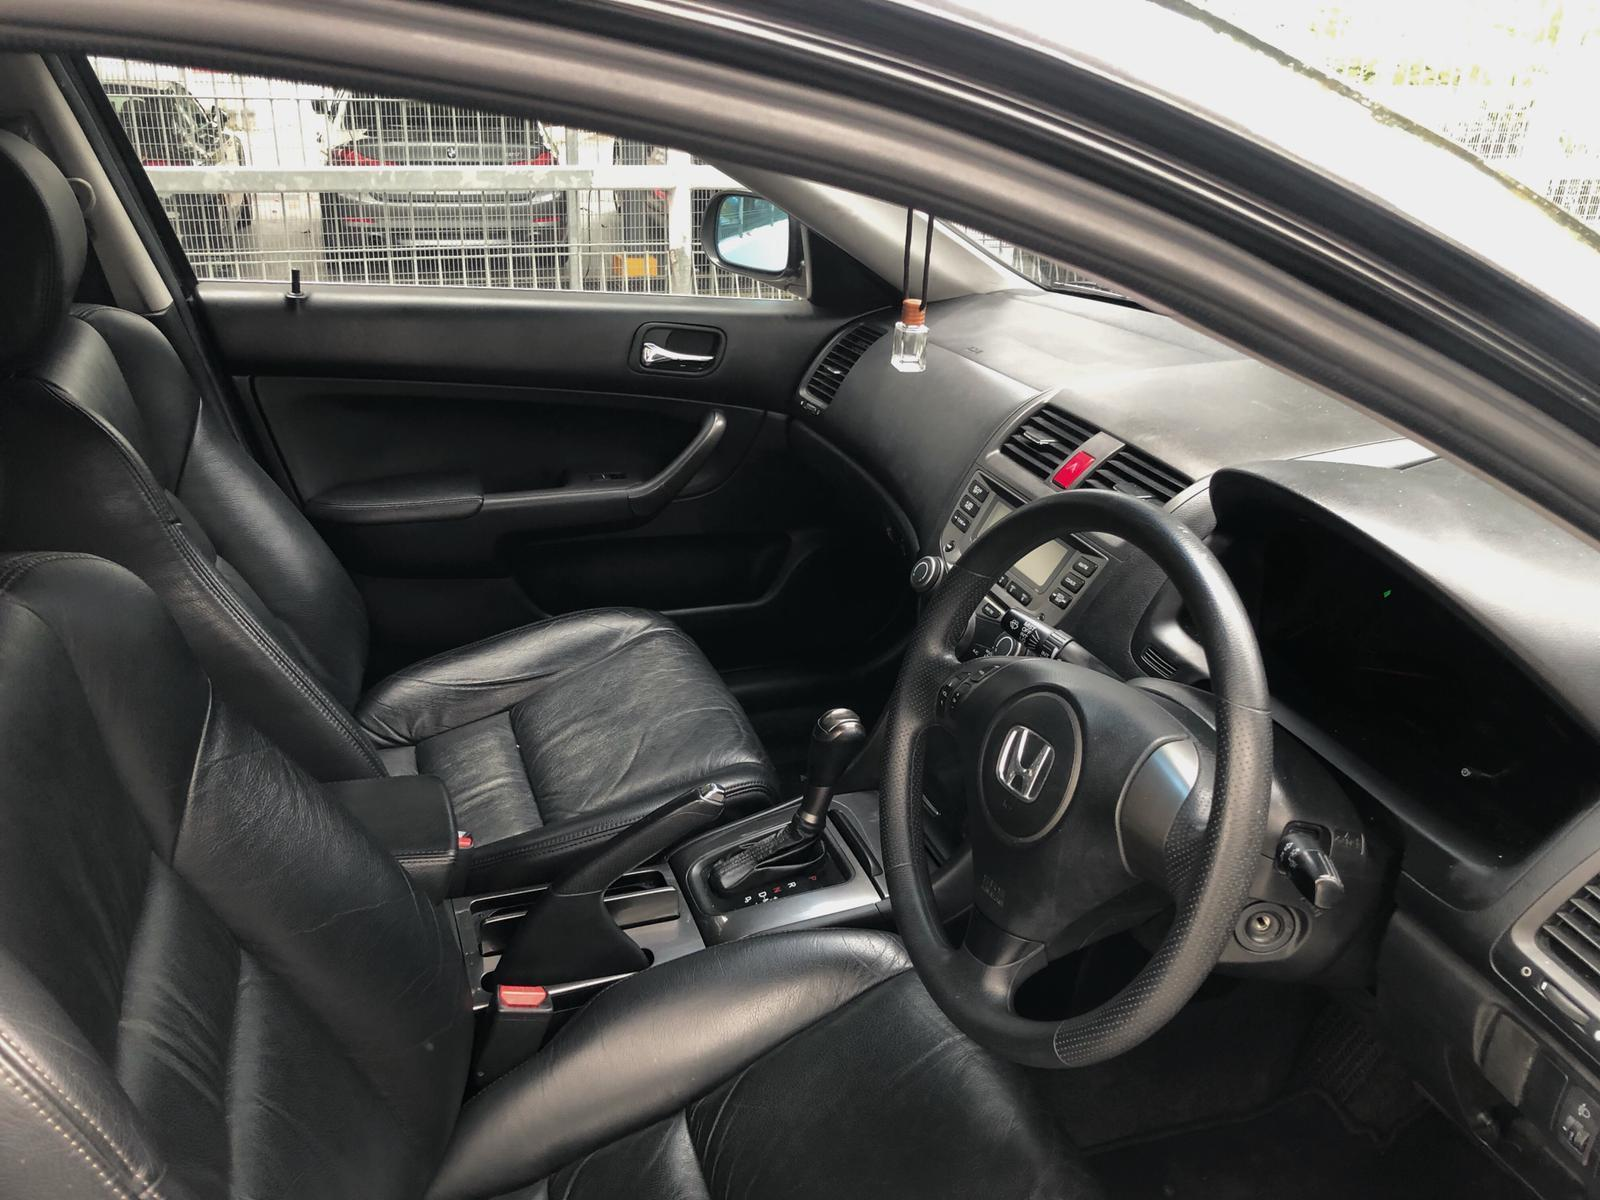 Honda Accord RENT SUPER CHEAP RENTAL FOR Grab/Ryde/Personal USAGEG